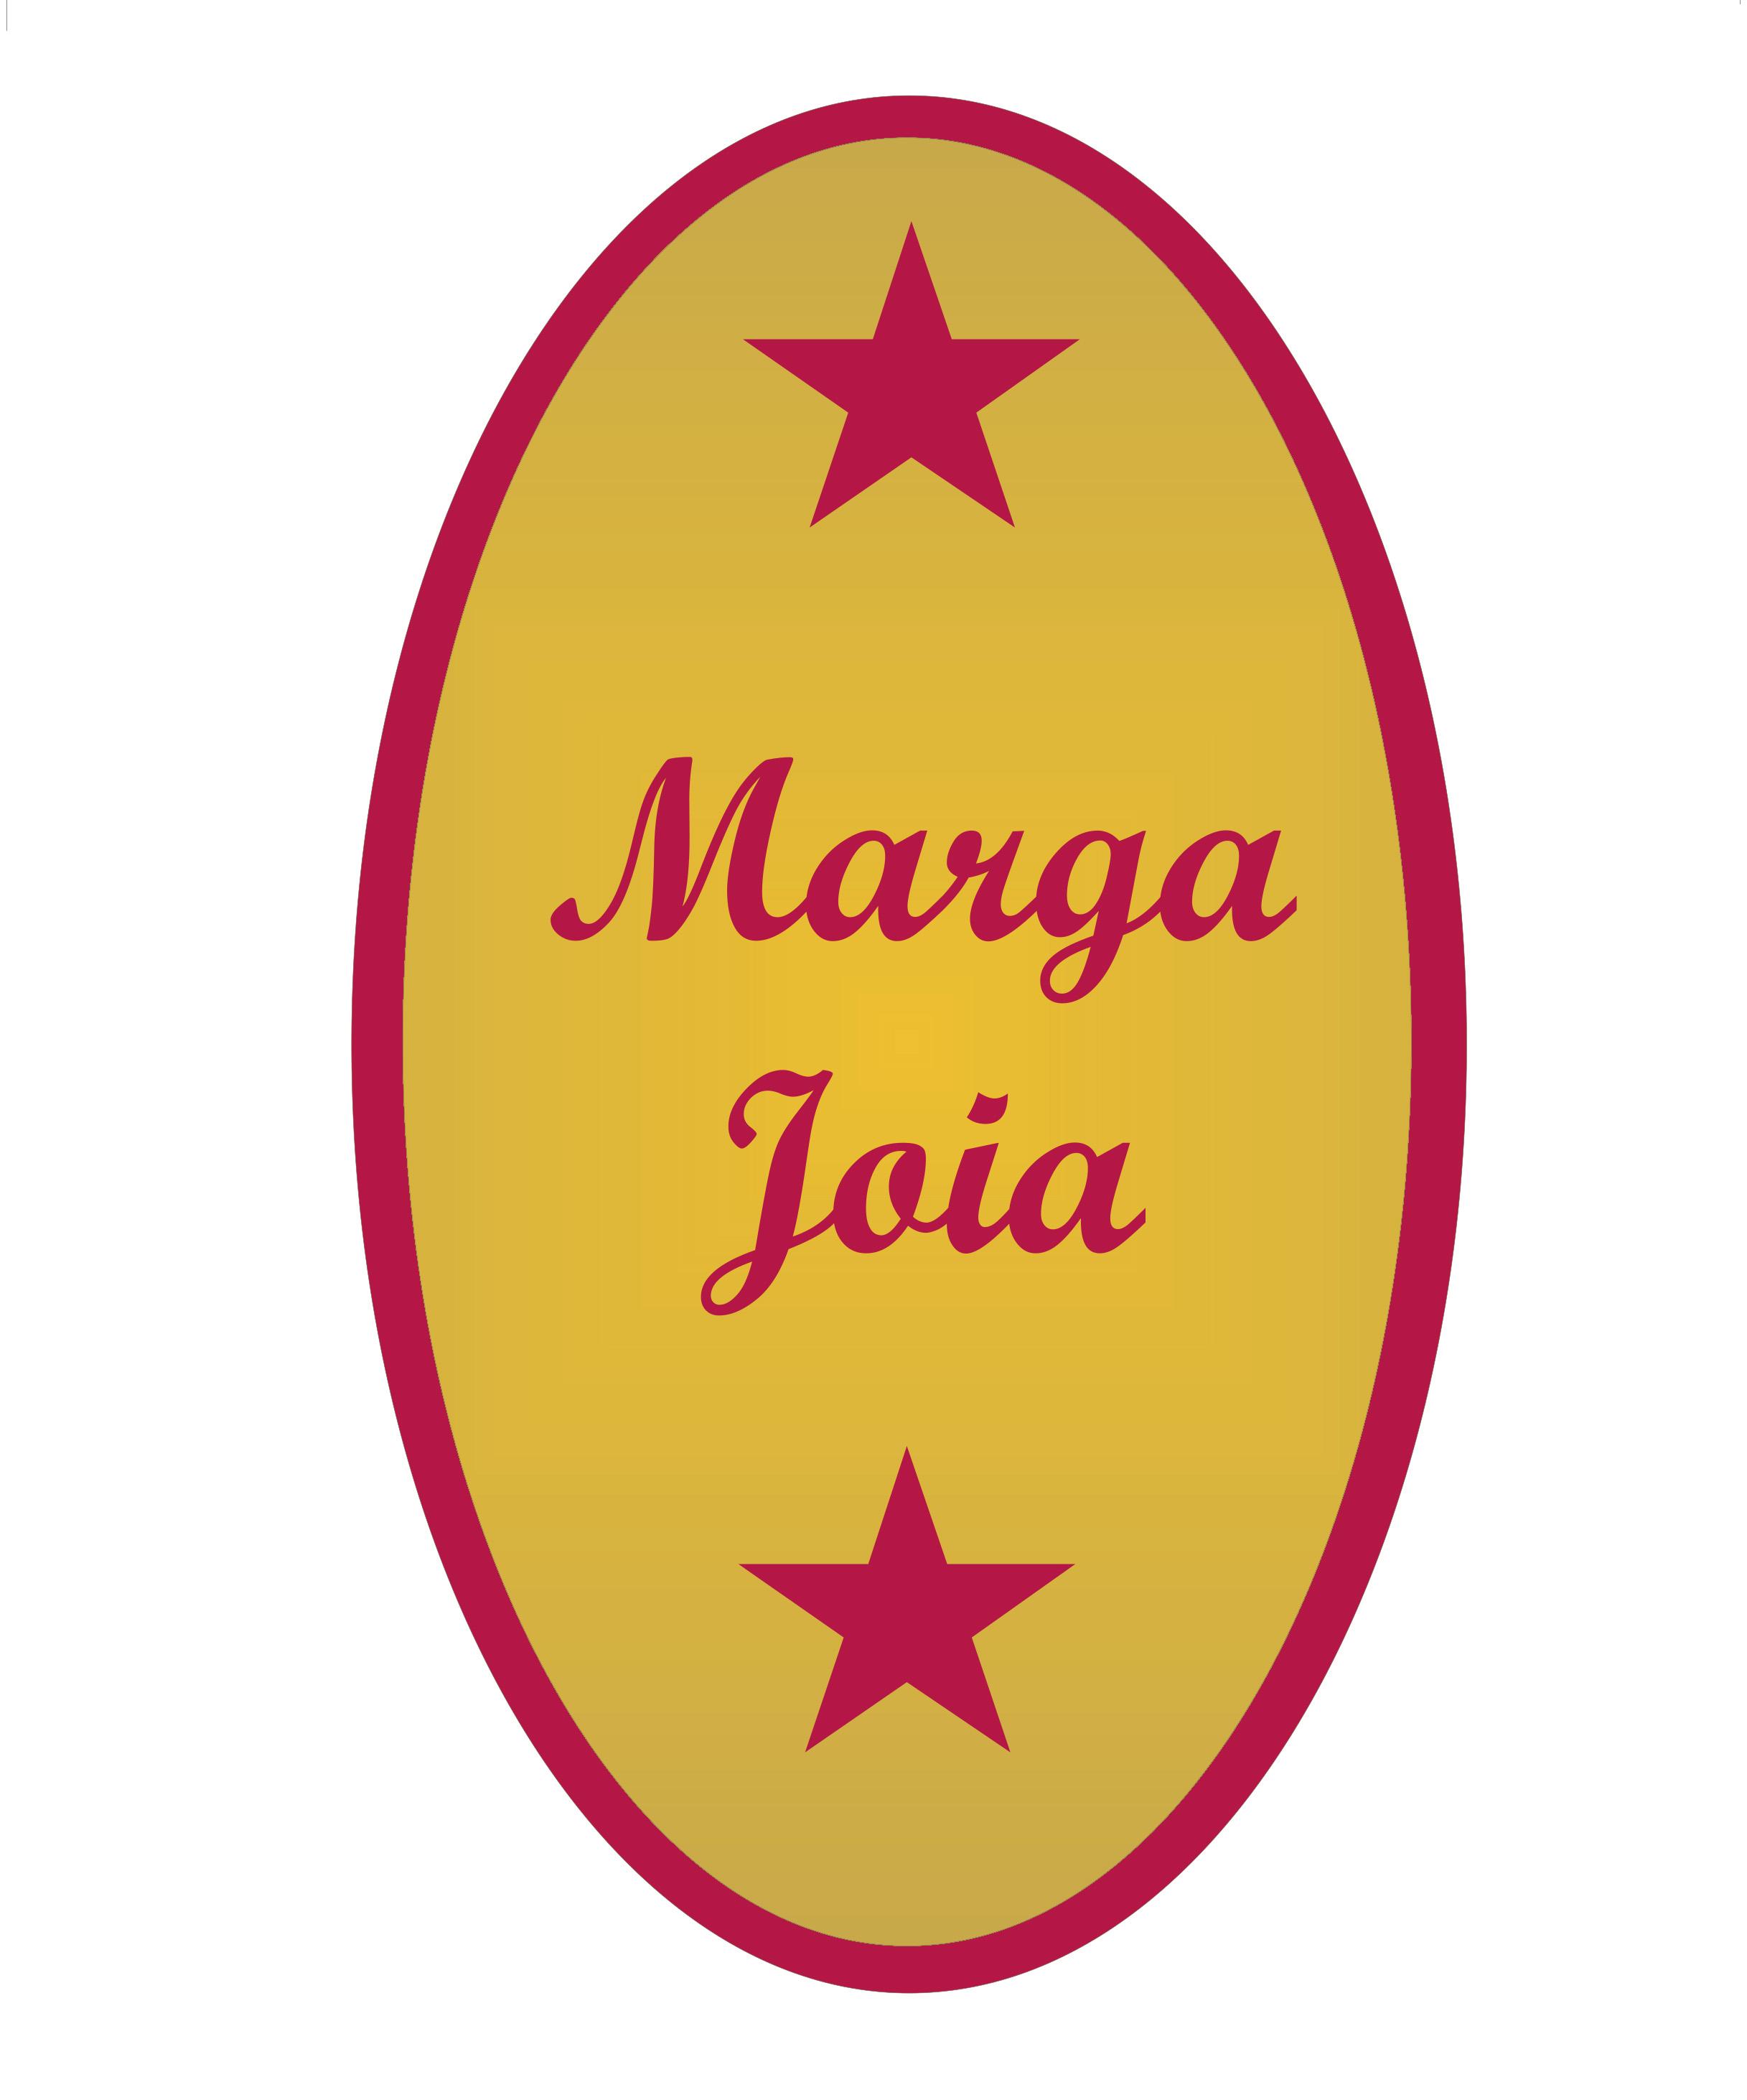 MARGA JOIA